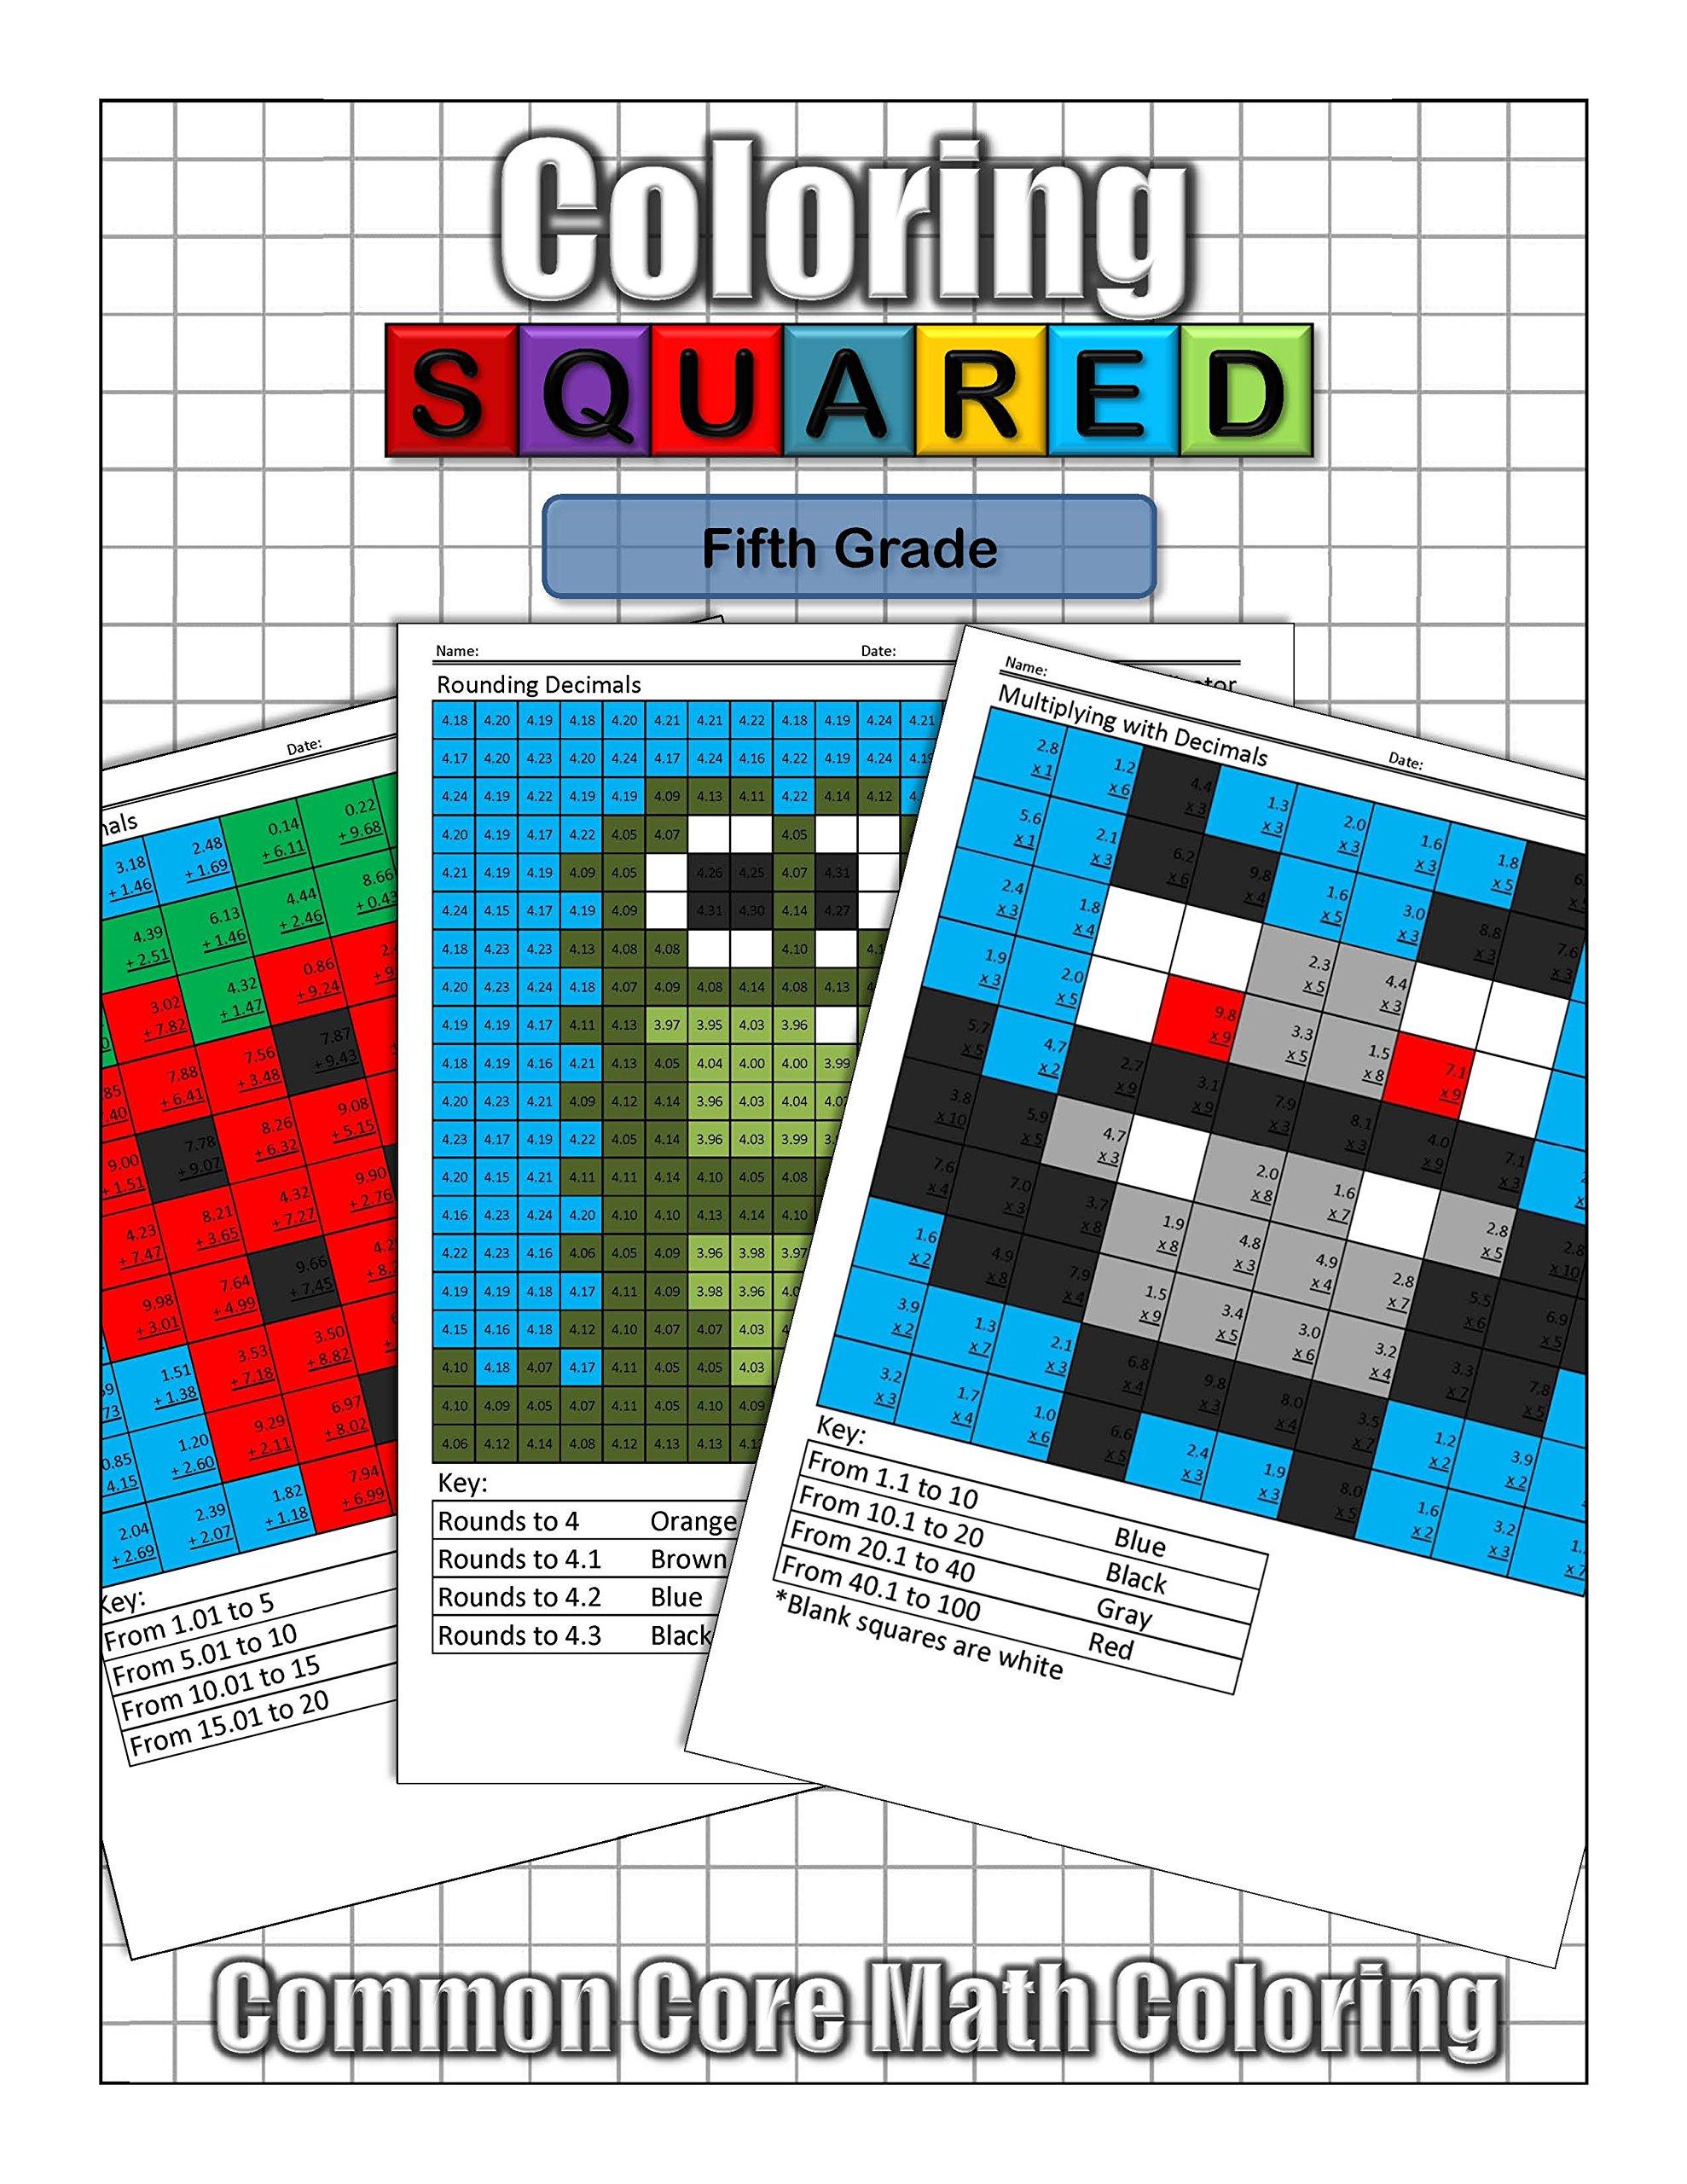 Coloring Squared: Fifth Grade: Cameron Krantzman: 9781939668141 ...